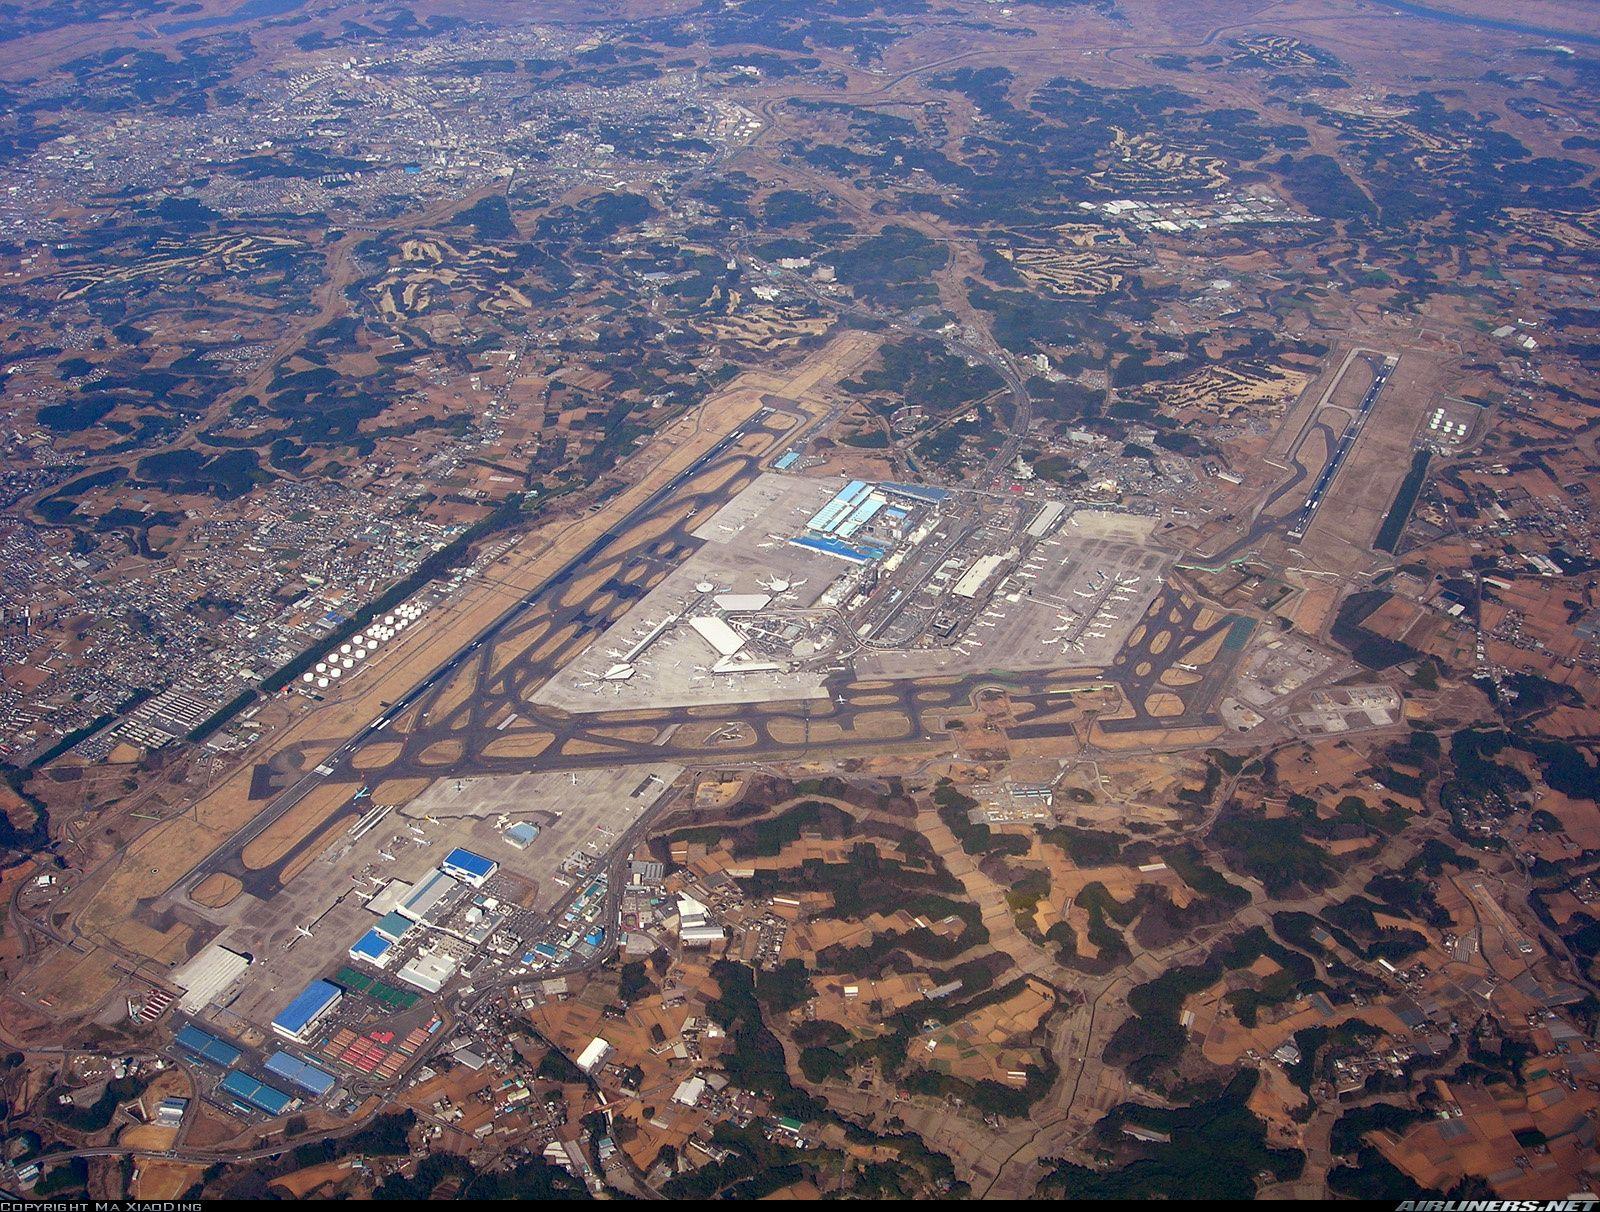 Tokyo Narita Asia Travel Aircraft Pictures Aviation